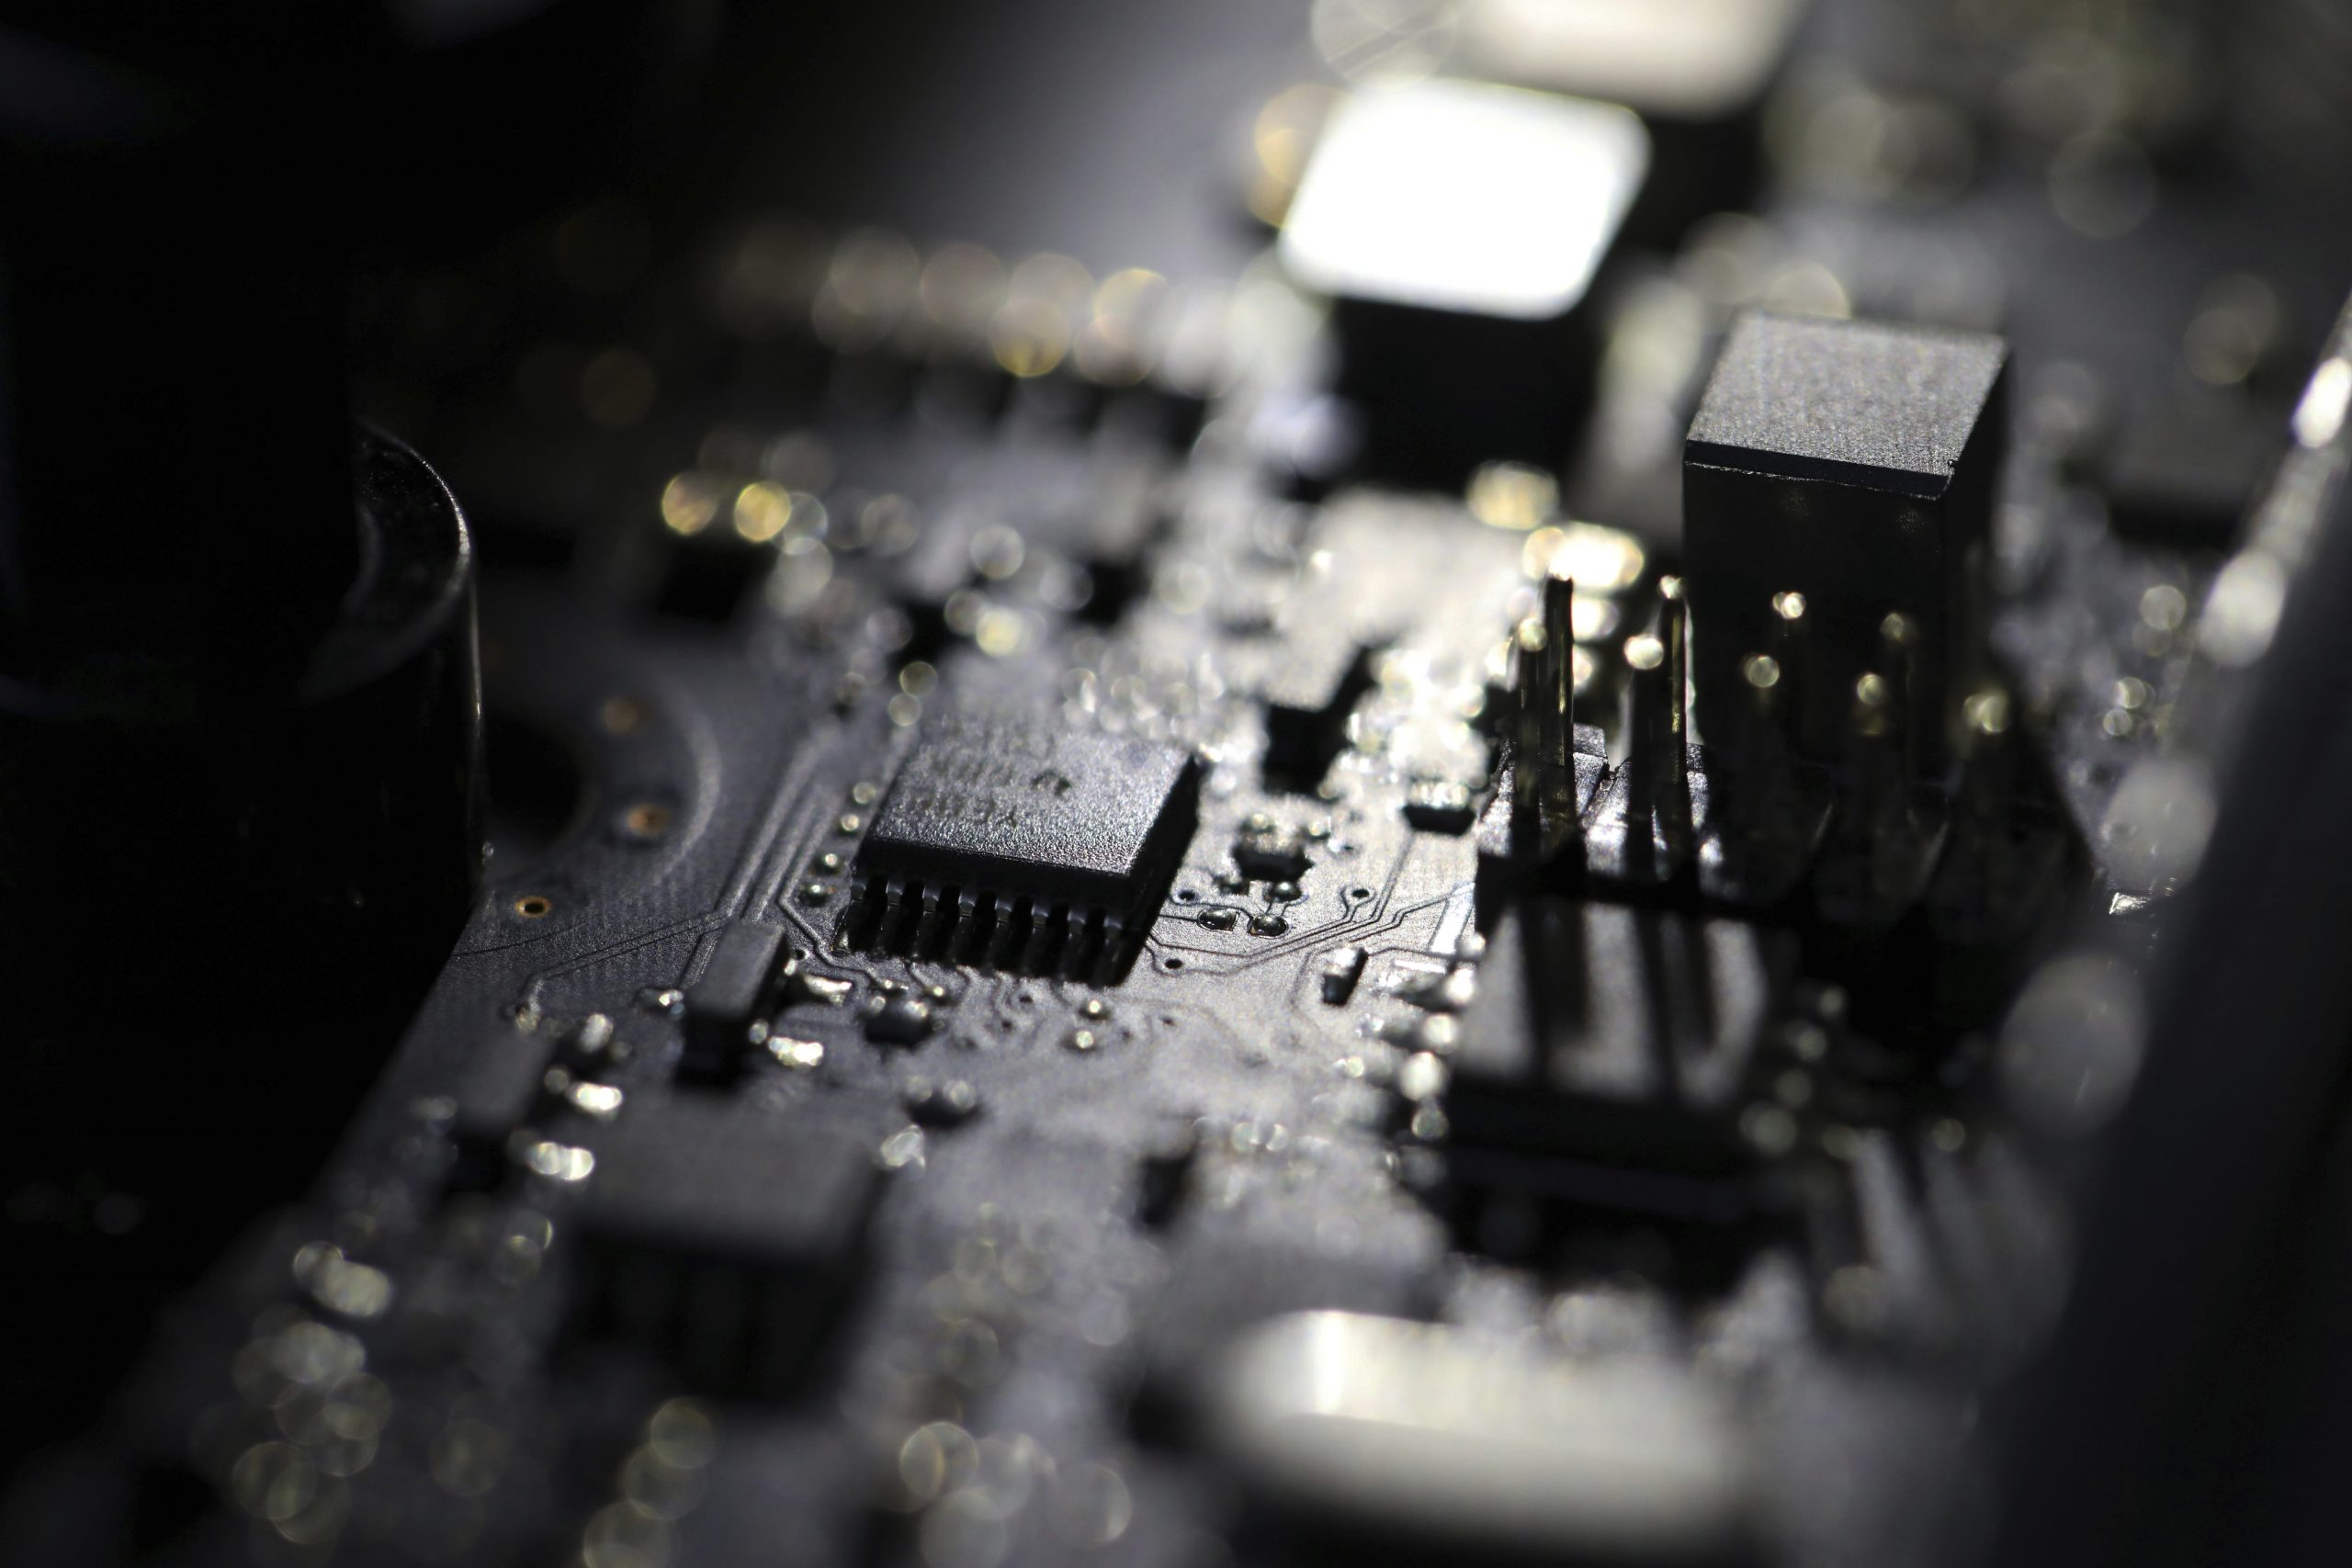 Dai cavi ai chip: l'asse tecnologico Italia Usa prende forma